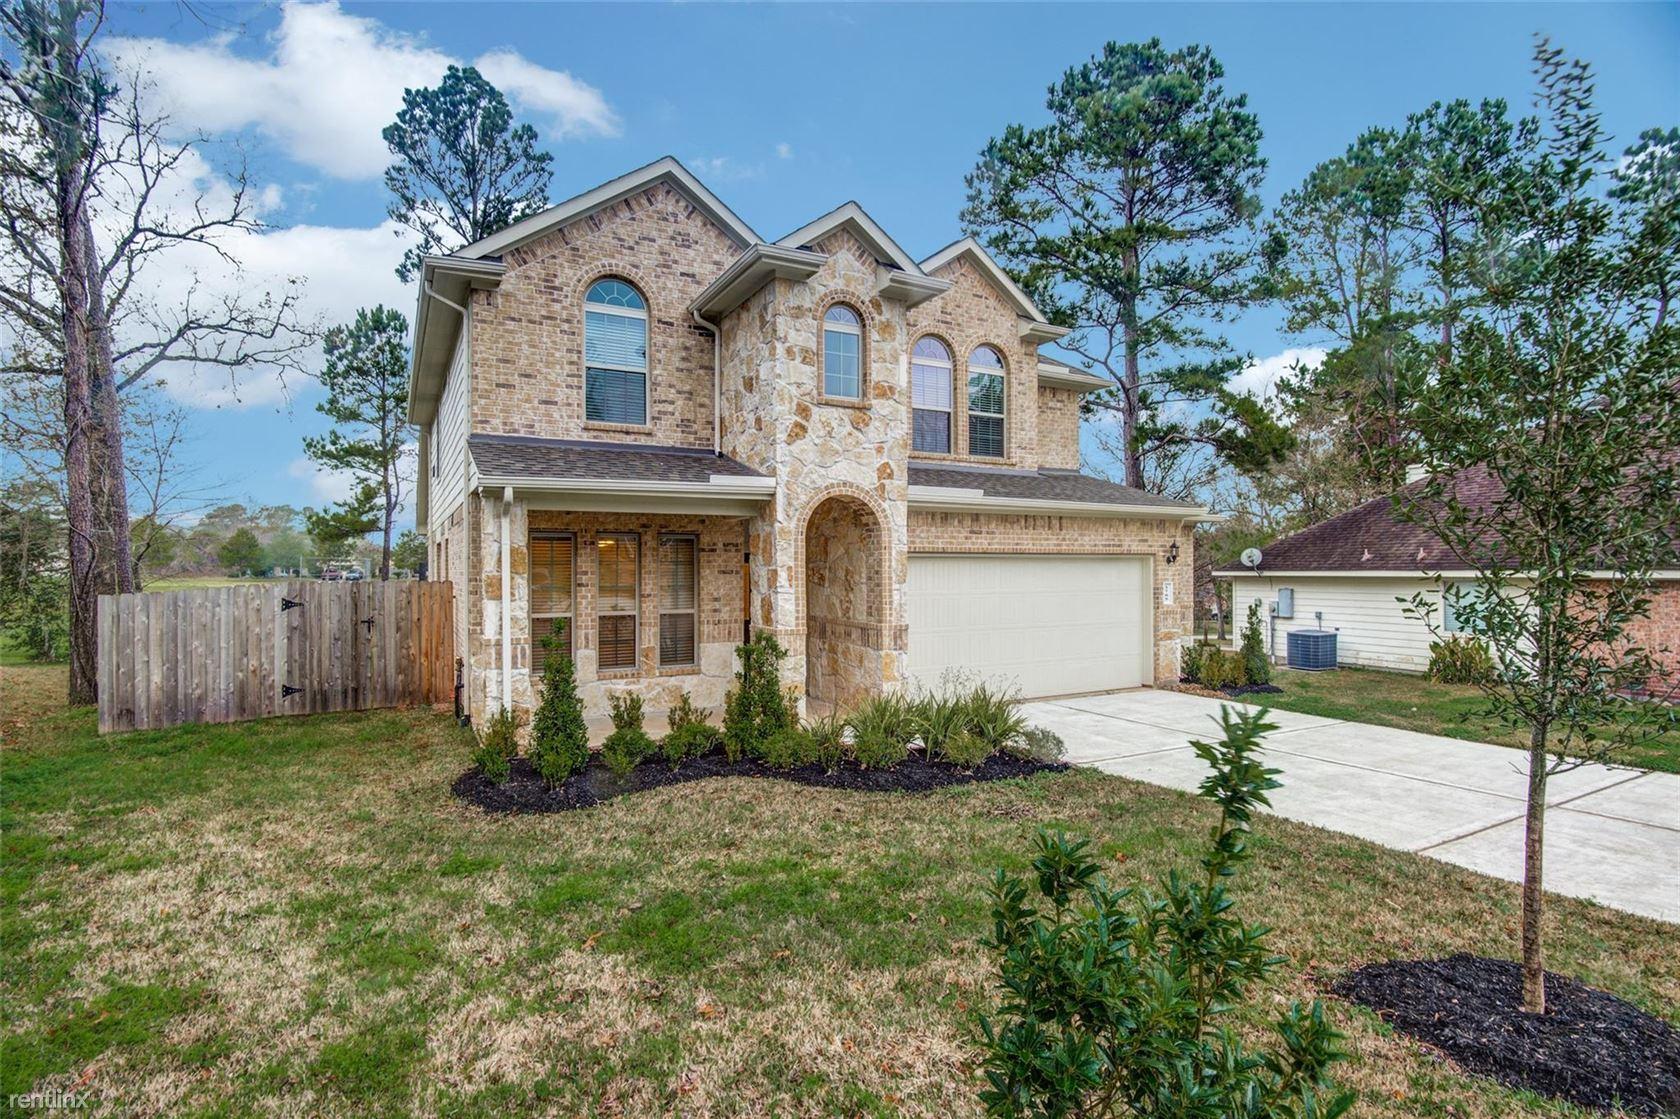 3705 Sunset Cir, Montgomery, TX - $2,000